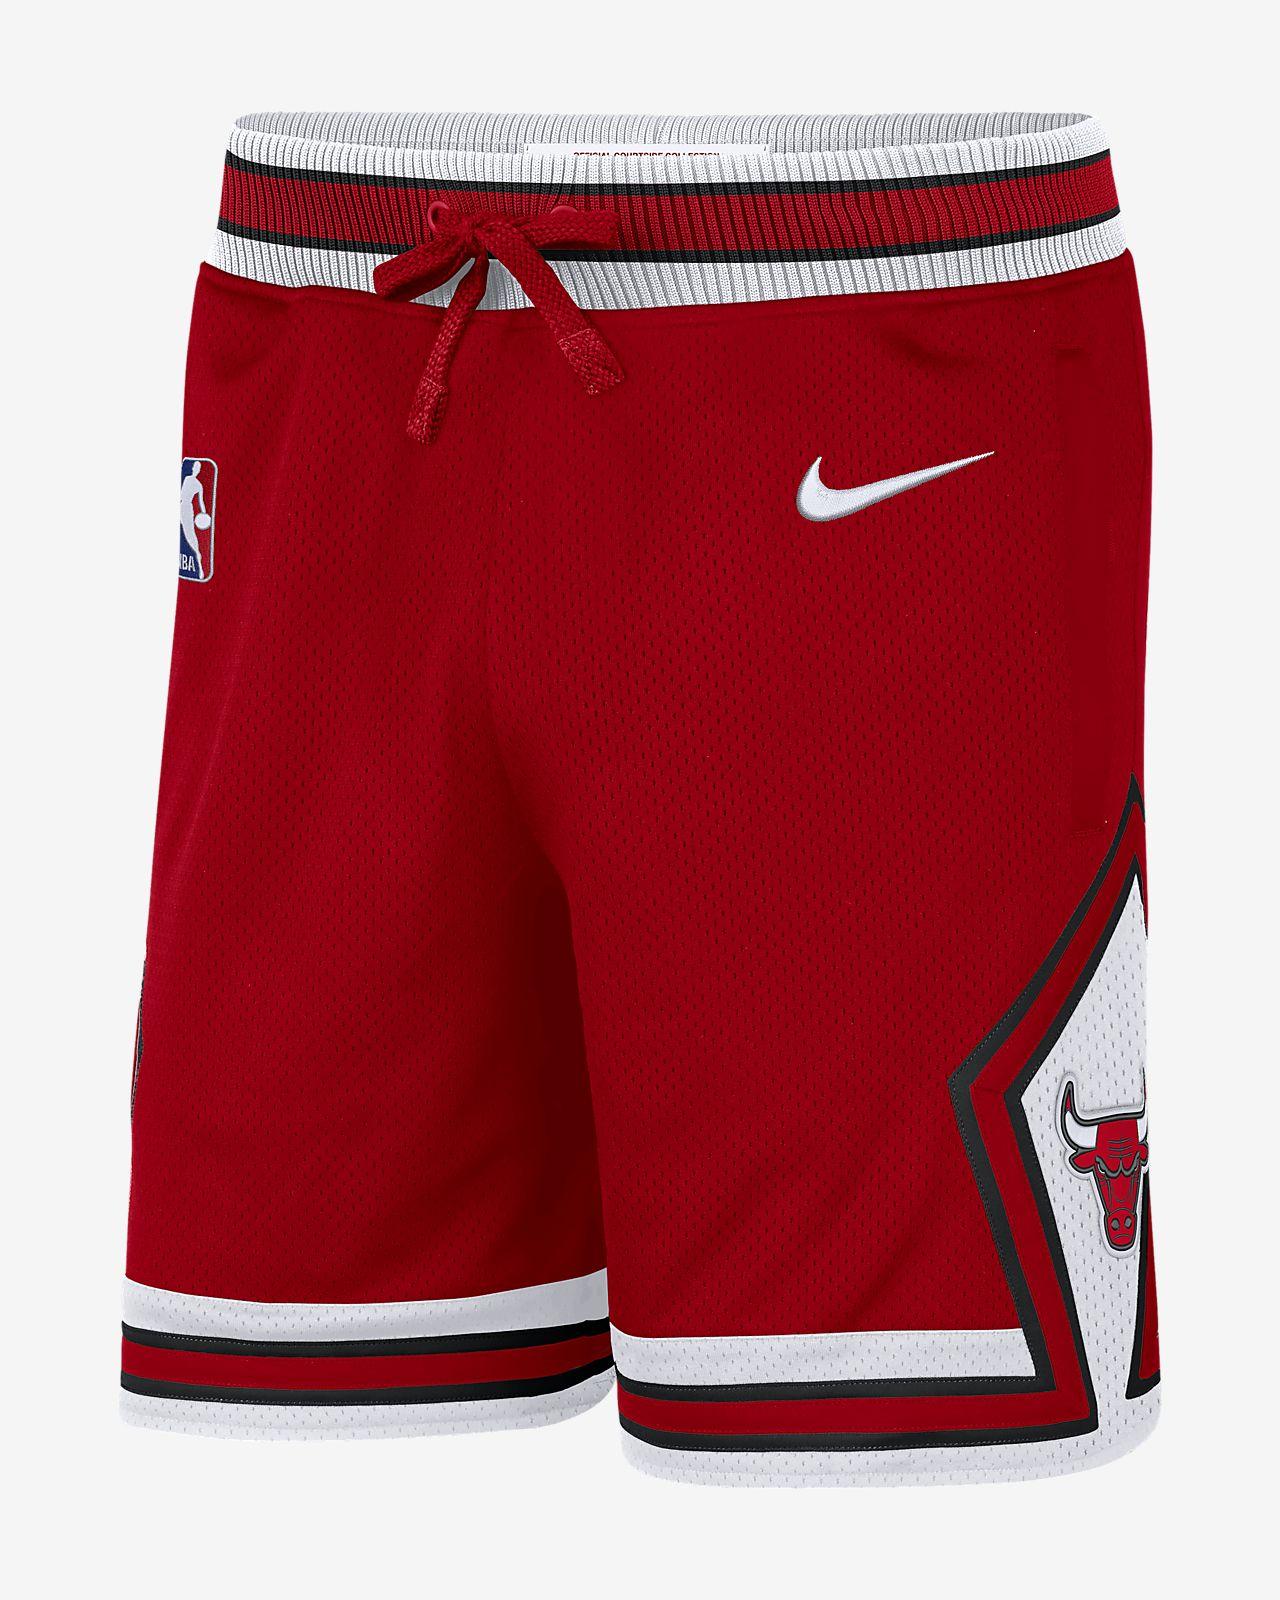 5b02a07d5a105 Chicago Bulls Nike Courtside Men's NBA Shorts. Nike.com